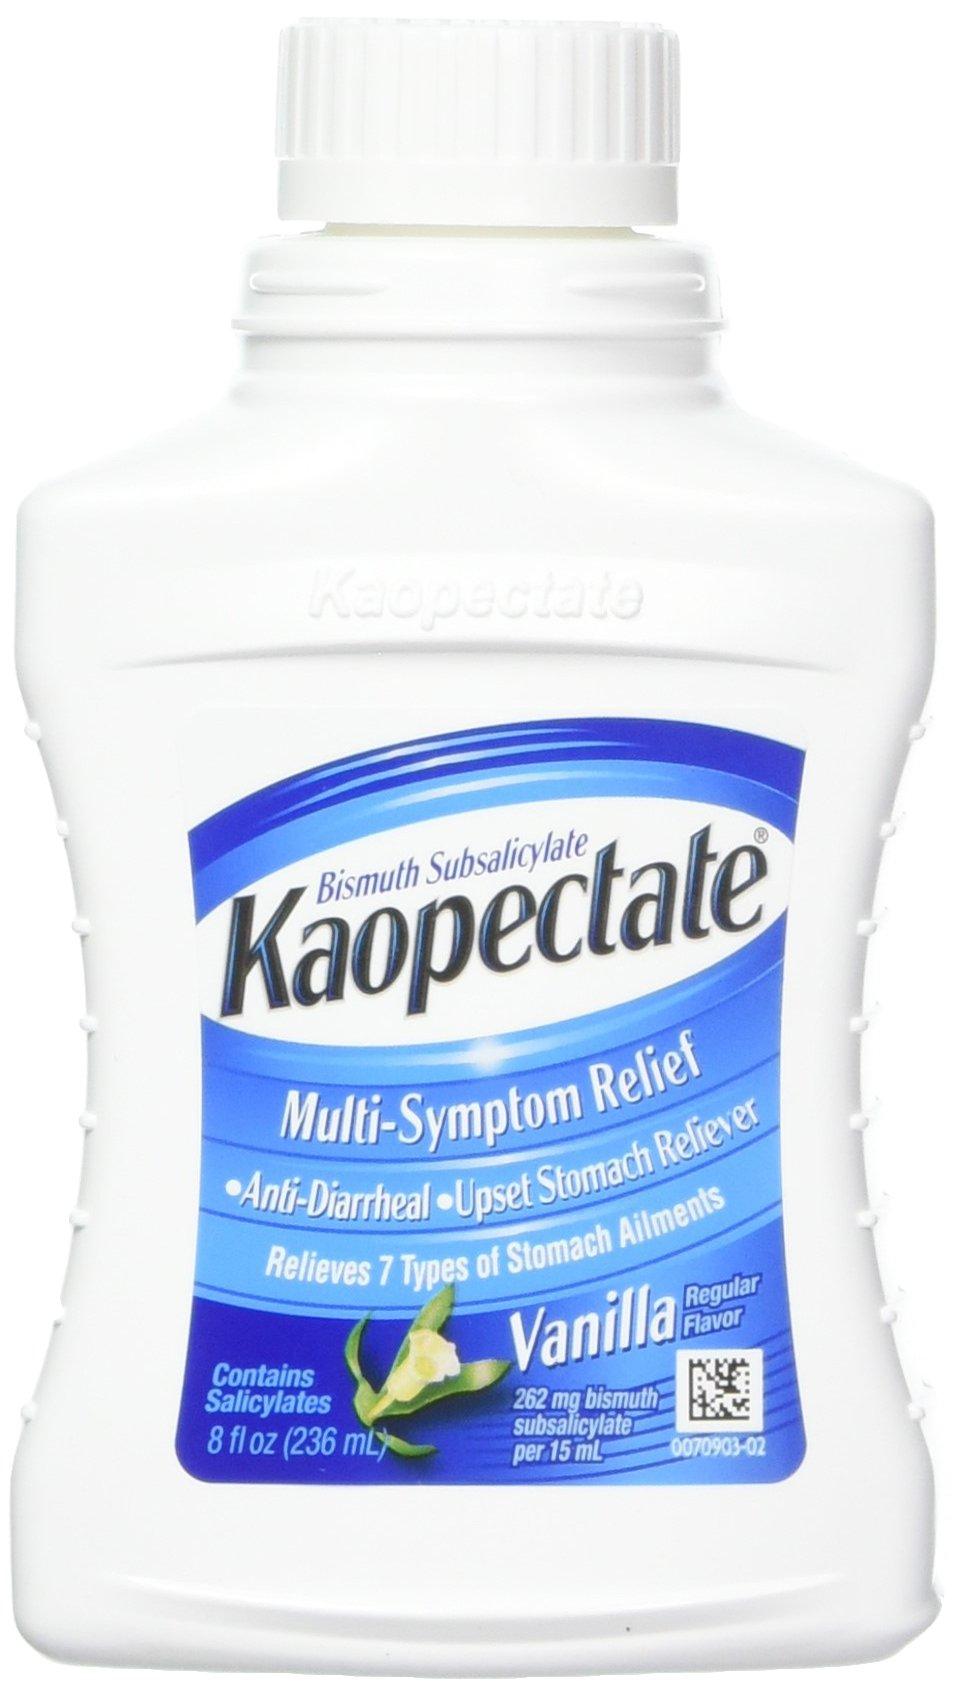 Kaopectate Multi-Symptom Relief